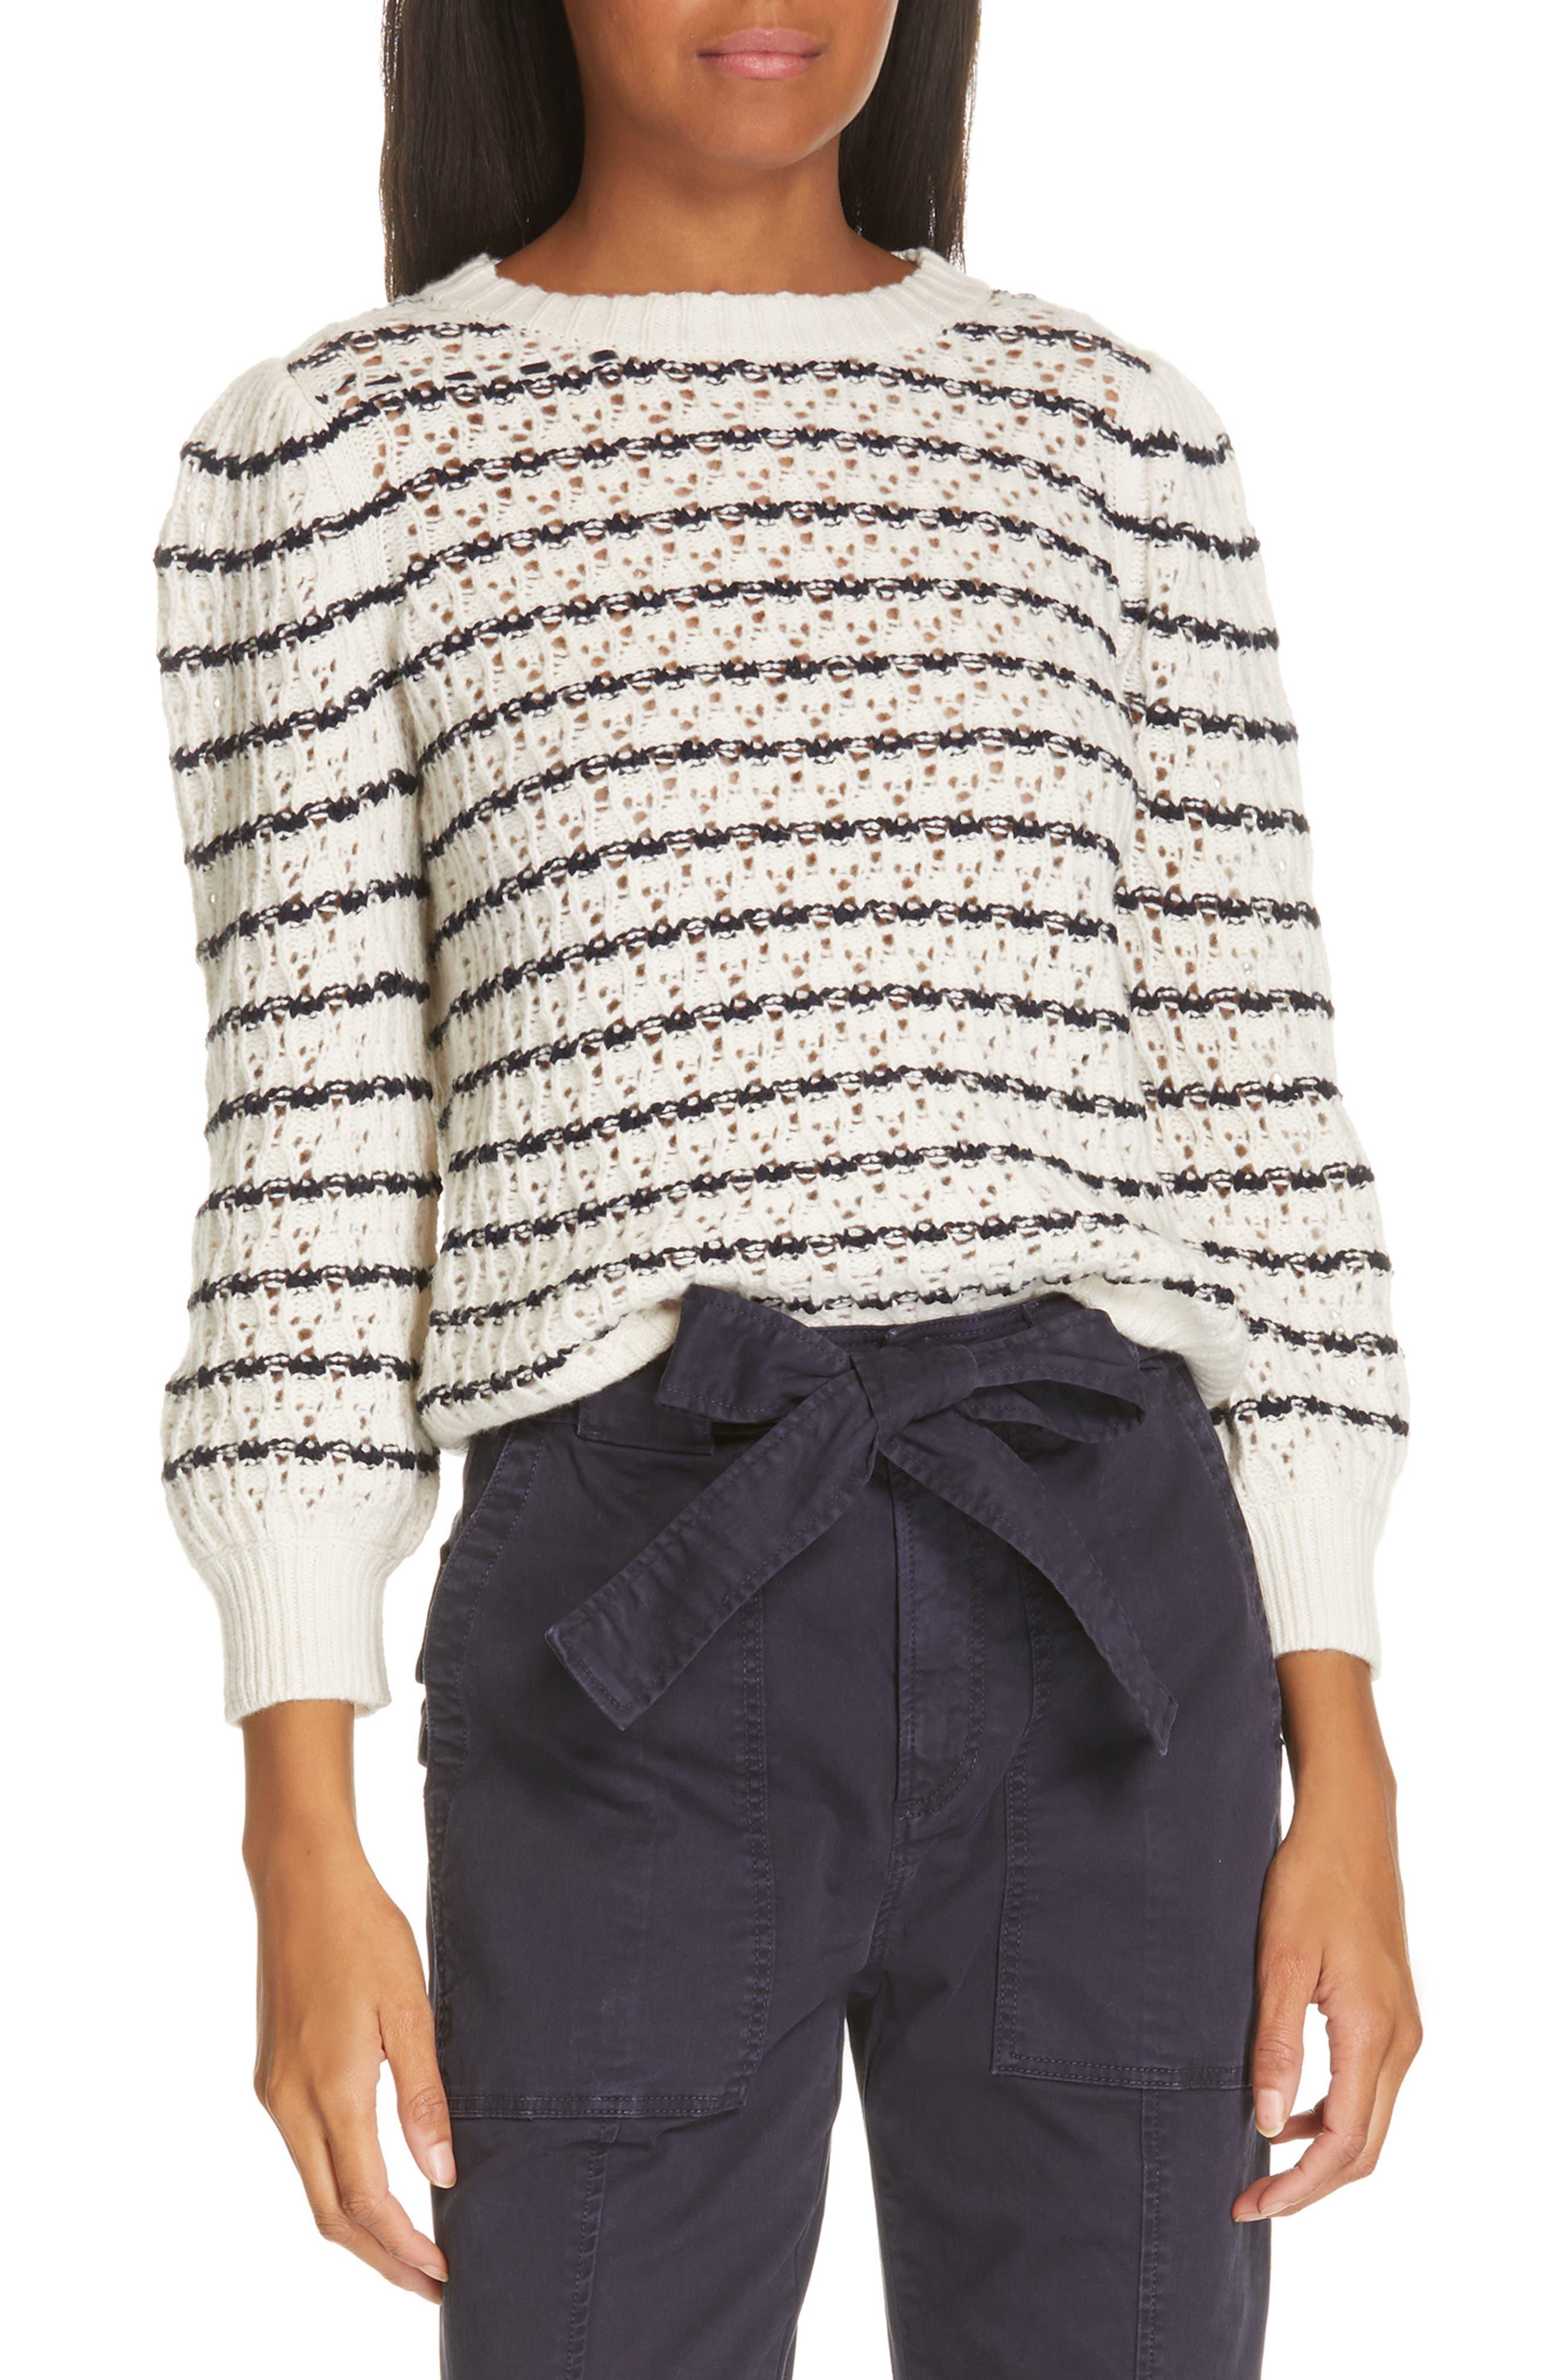 LA VIE REBECCA TAYLOR Stripe Pointelle Sweater, Main, color, ECRU/ MIDNIGHT NAVY